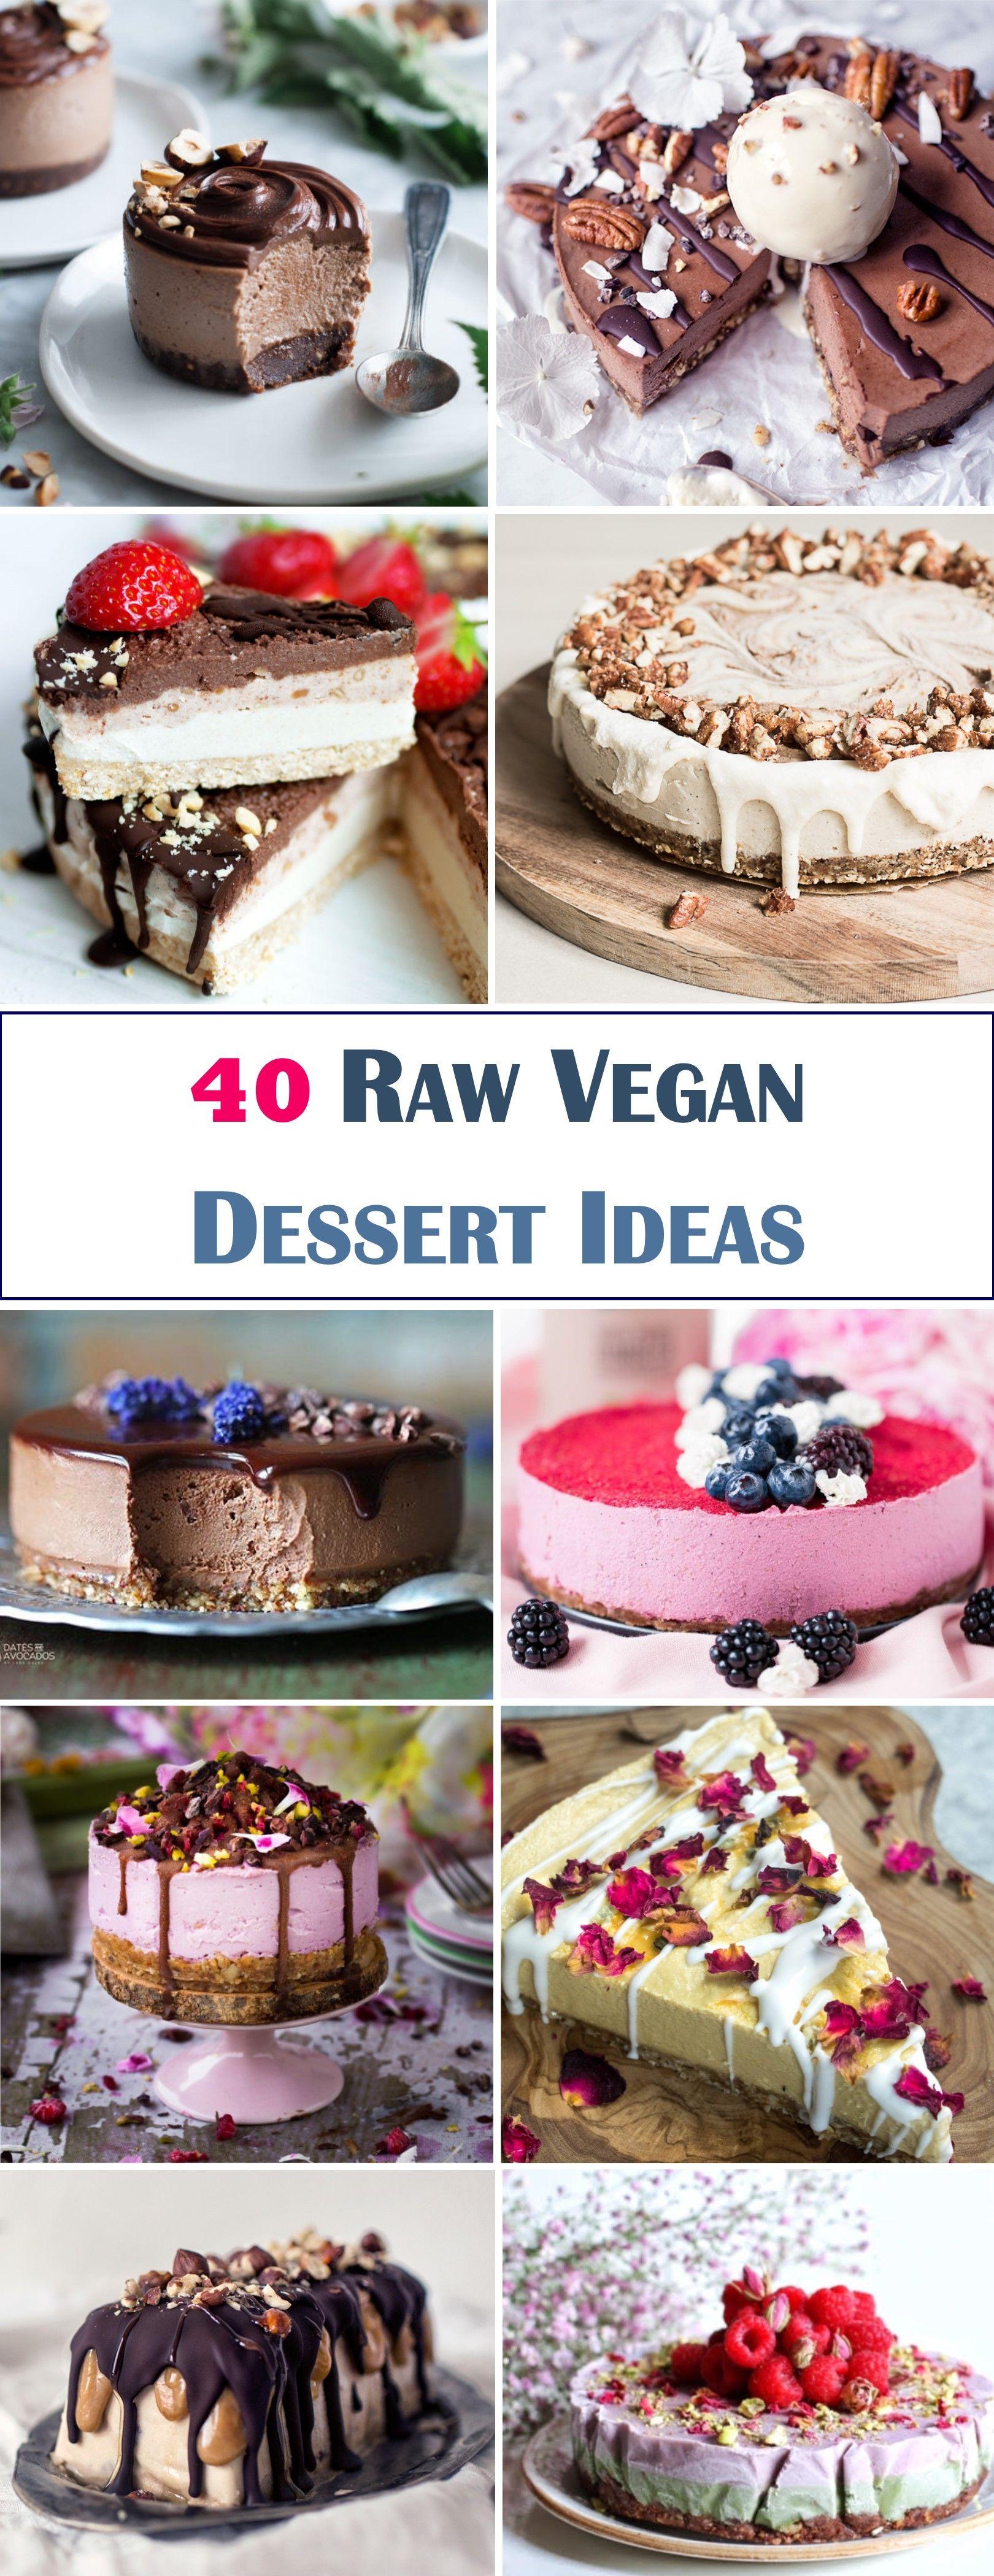 40 raw vegan dessert recipe ideas gluten free refined sugar free 40 raw vegan dessert recipe ideas gluten free refined sugar free using forumfinder Gallery